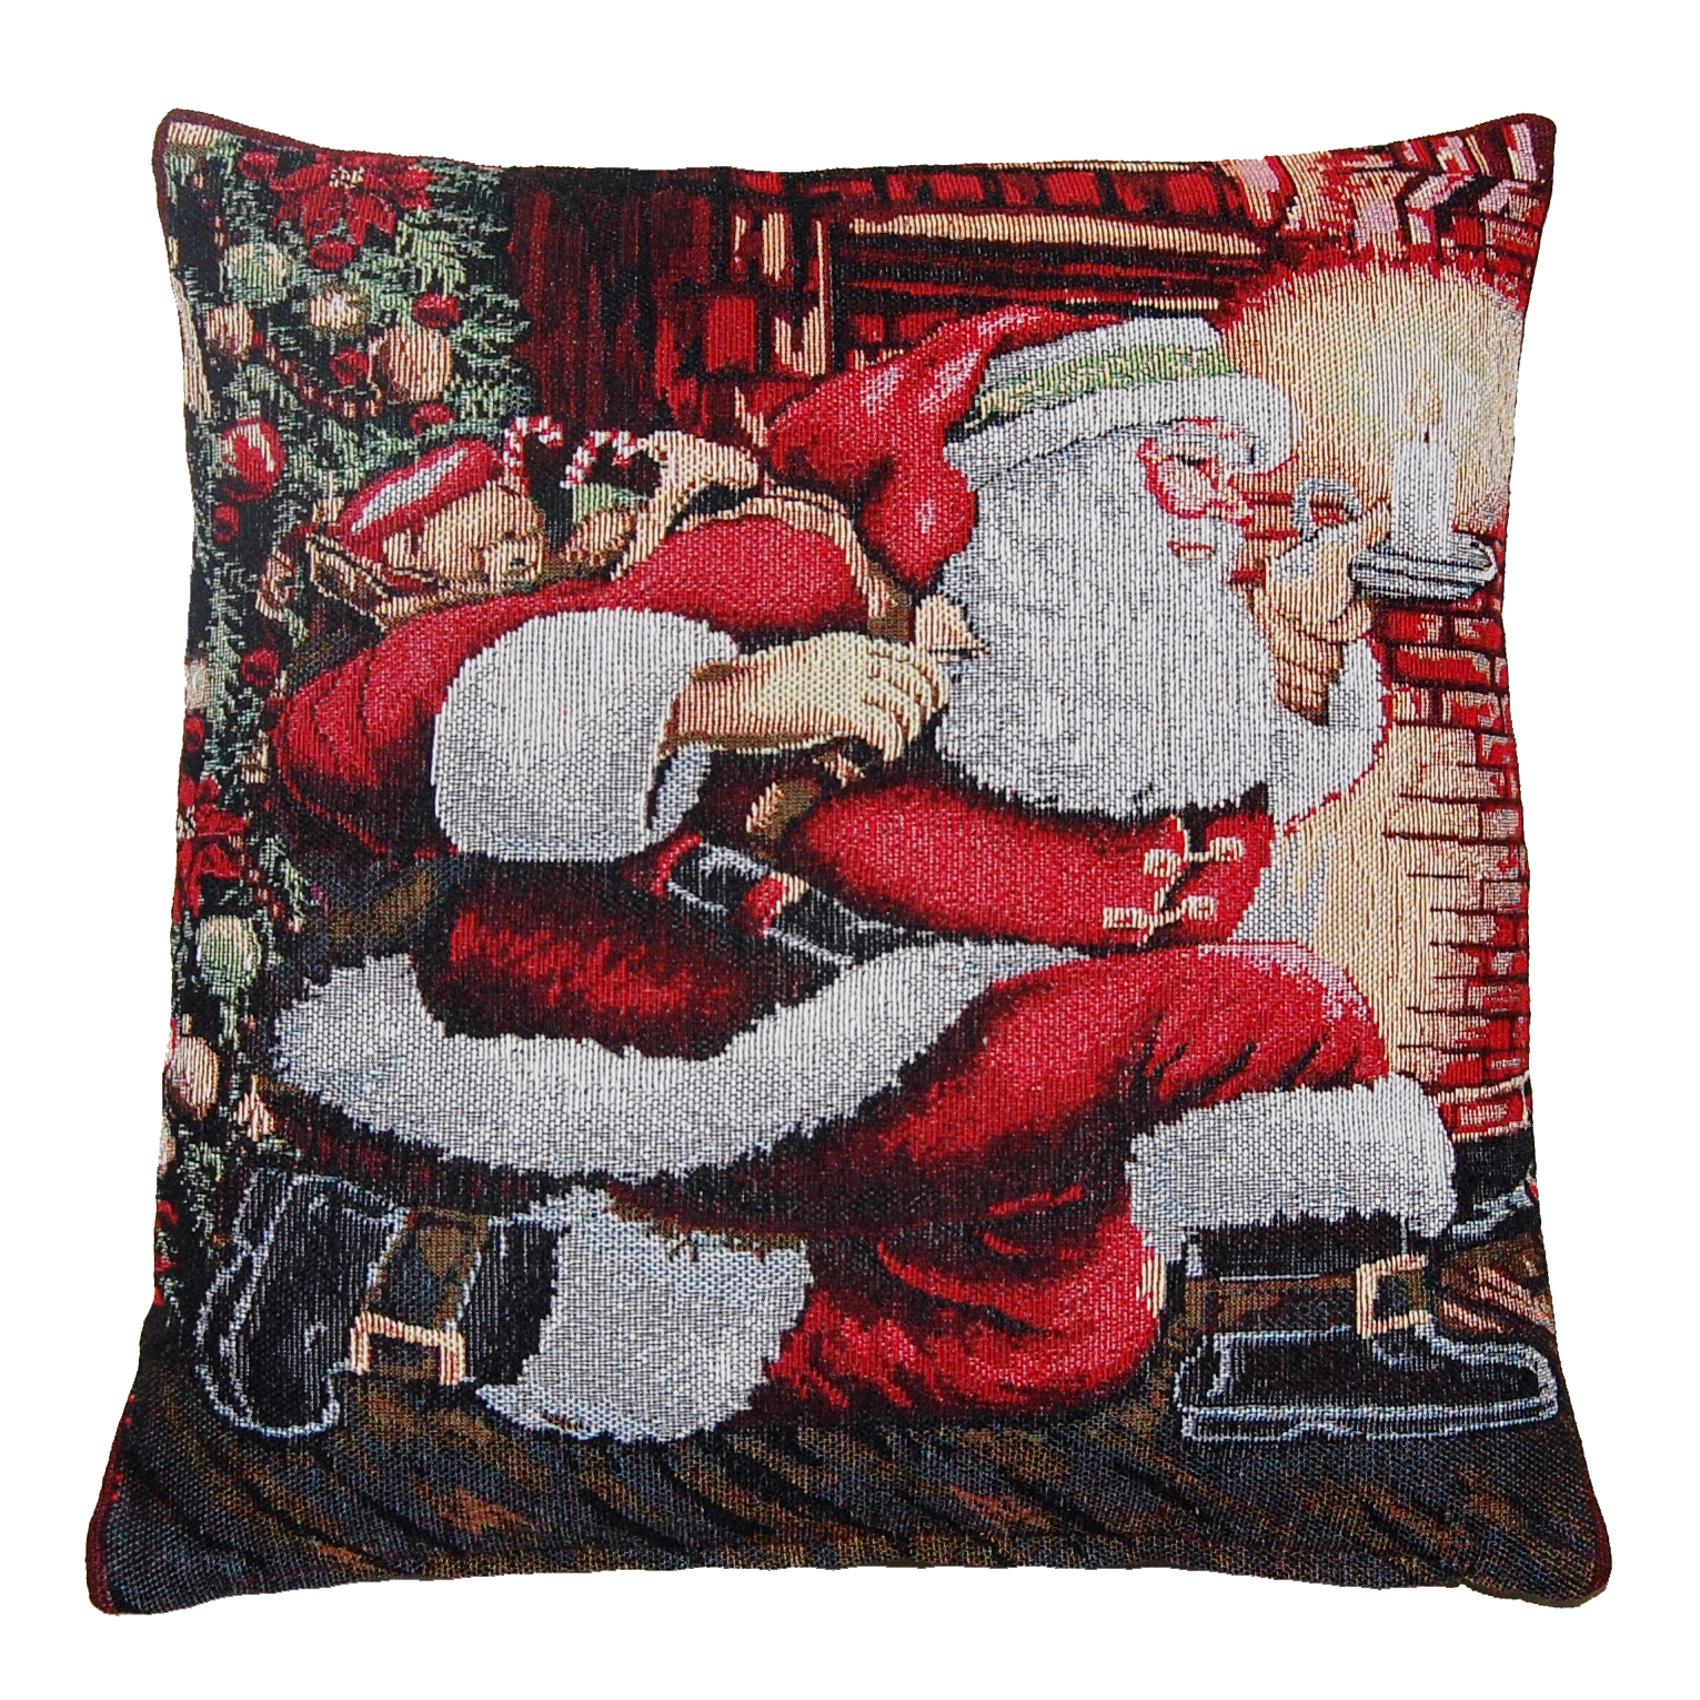 ebay uk christmas chair covers ot posture deluxe festive cushion decorative xmas